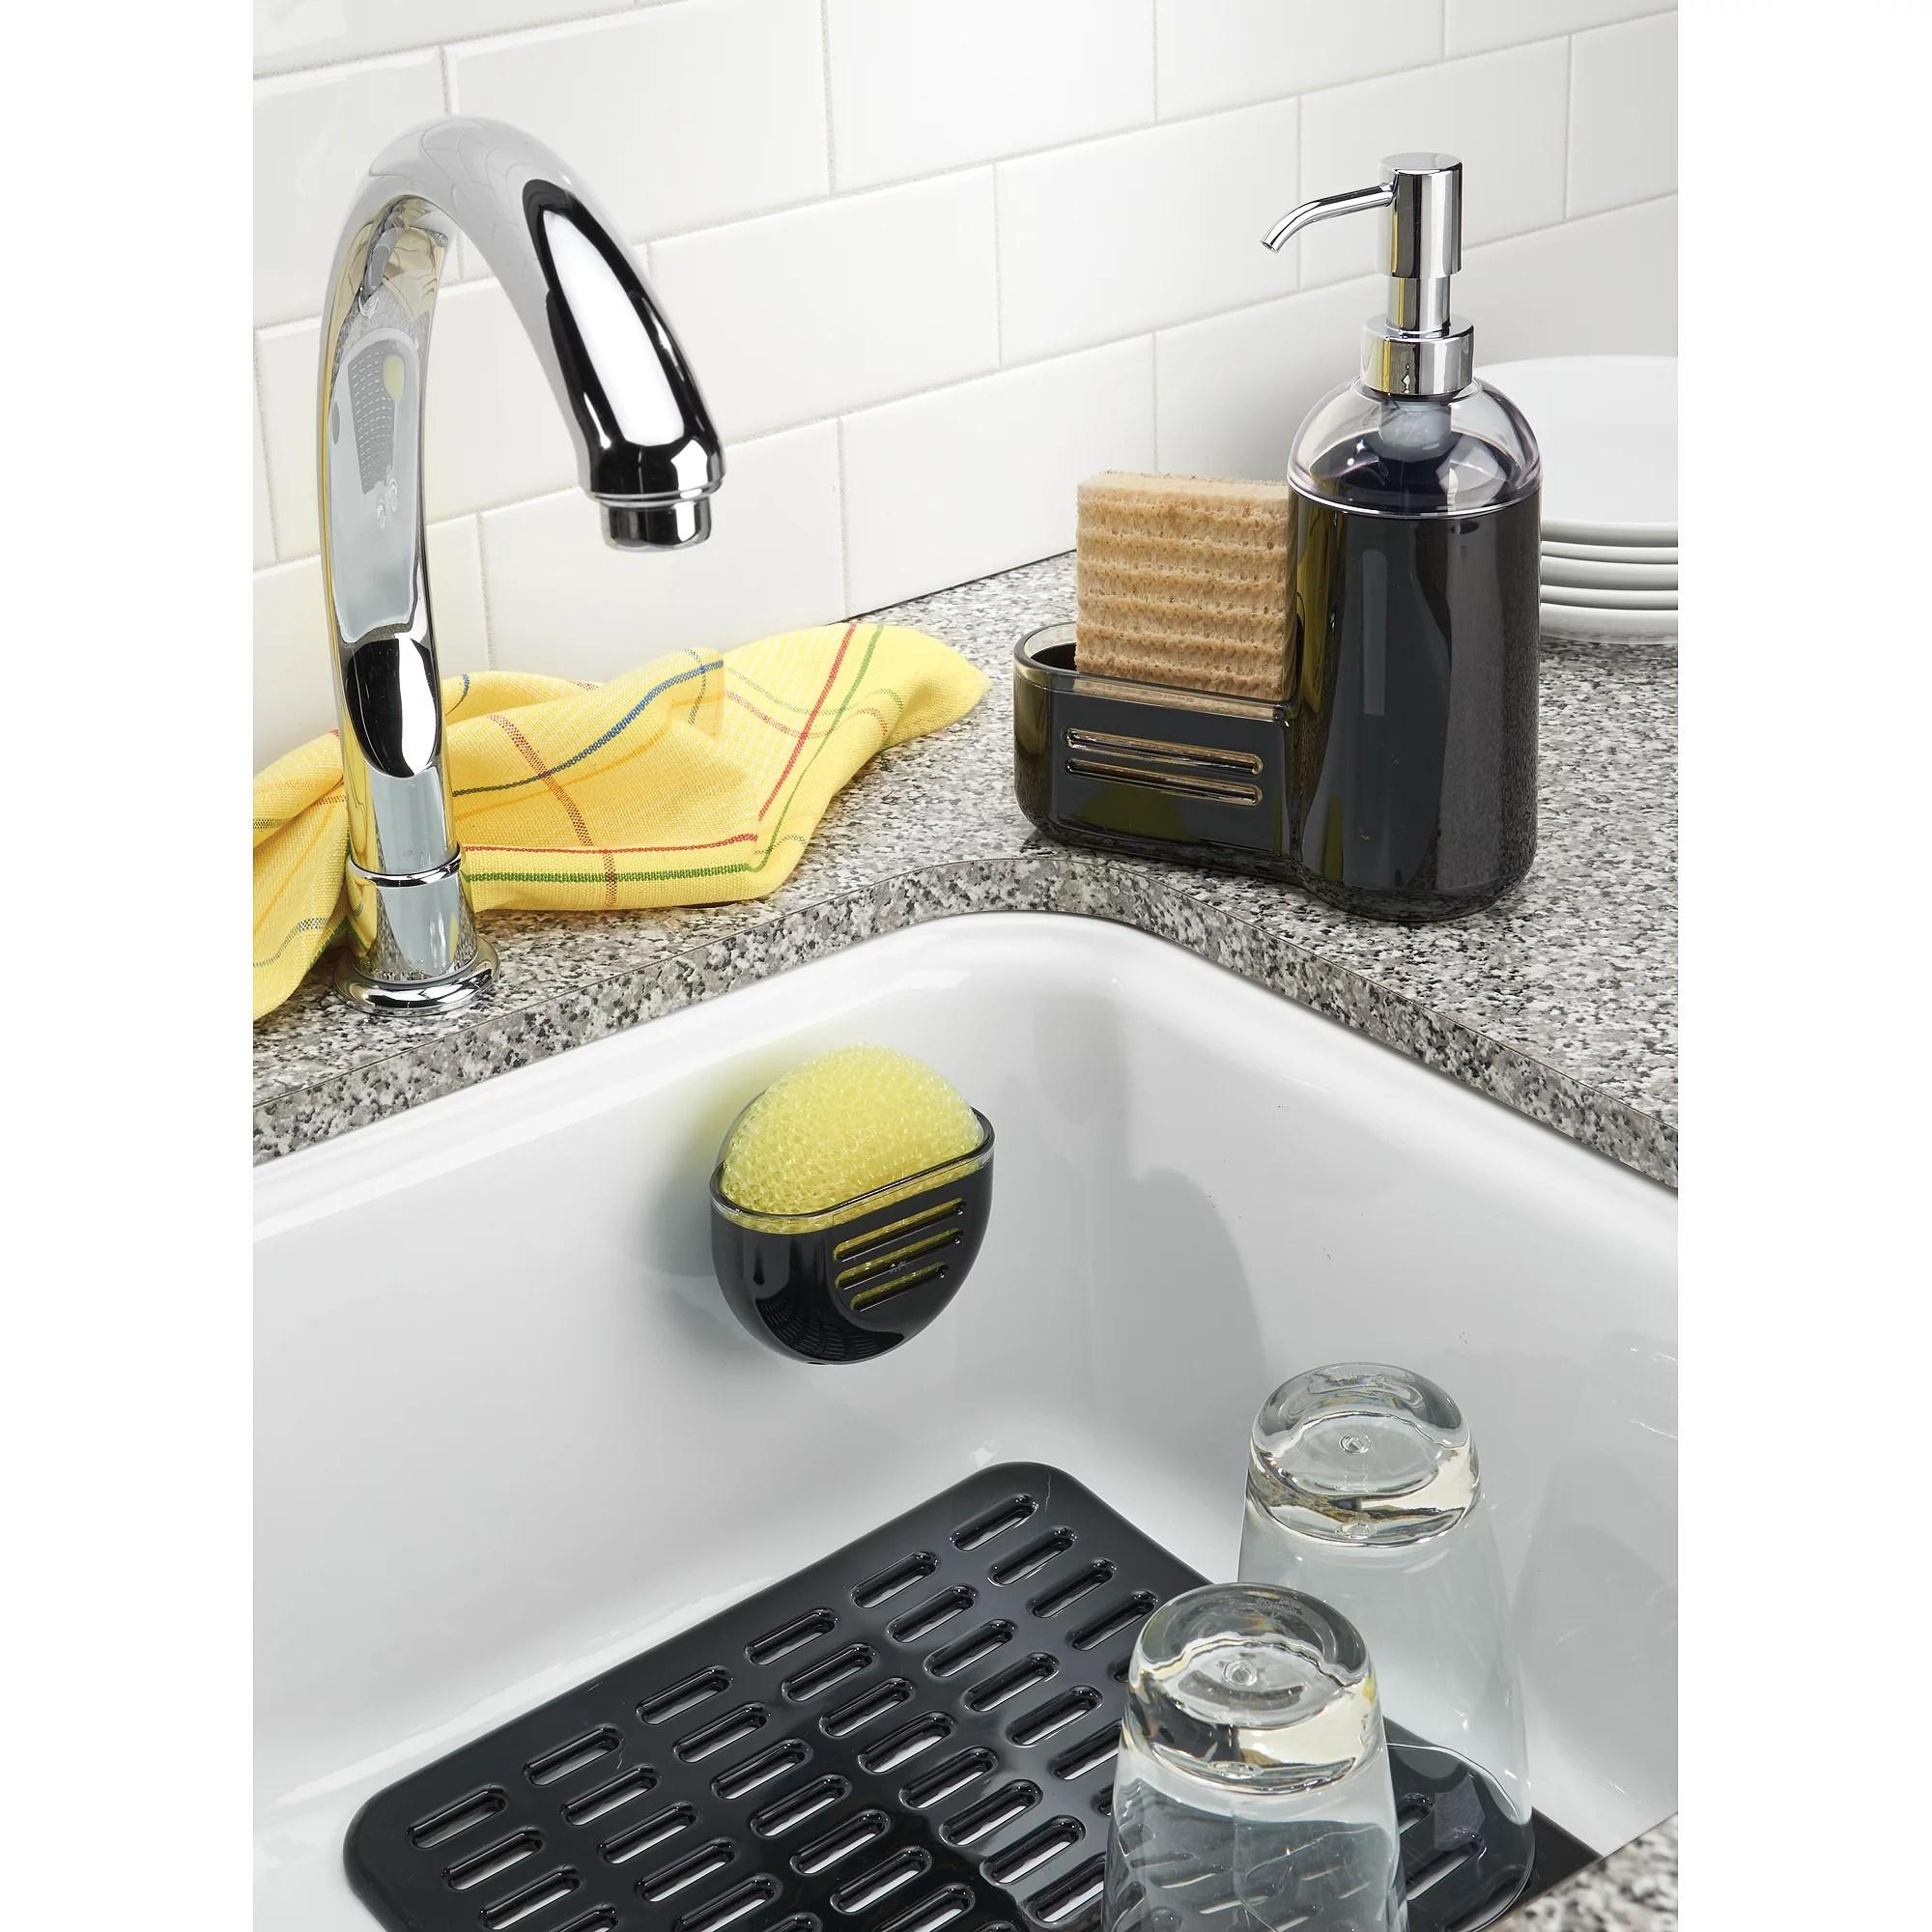 interdesign syncware kitchen sink protector mat large black